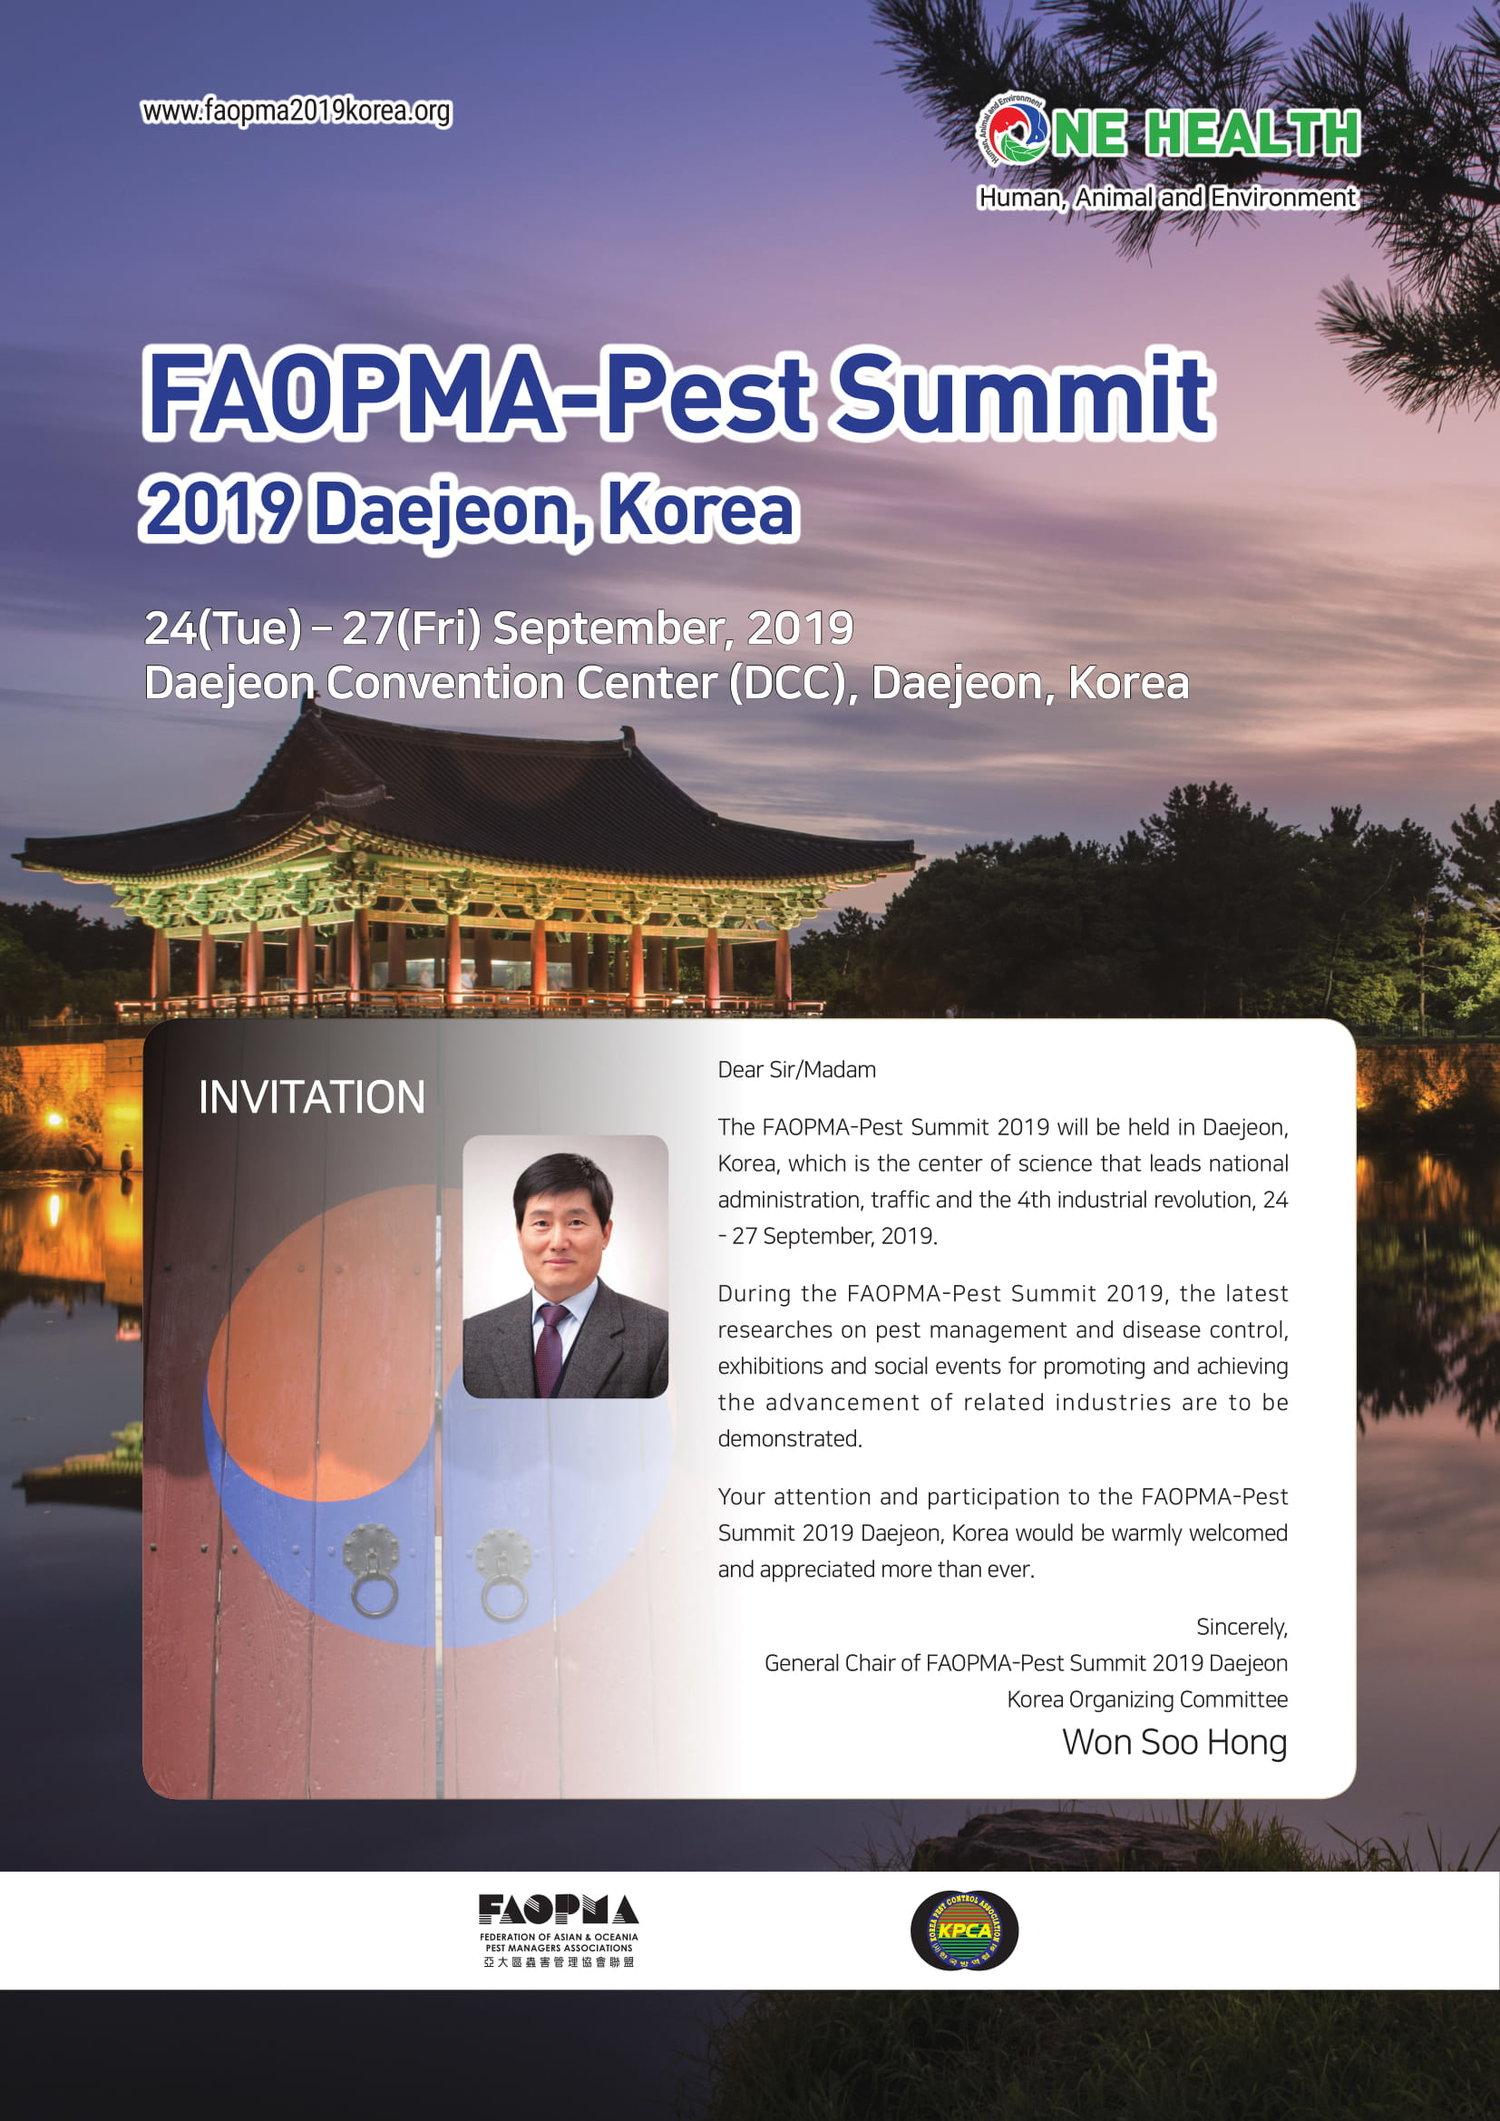 FAOPMA2019_Updatedflyer-1.jpg